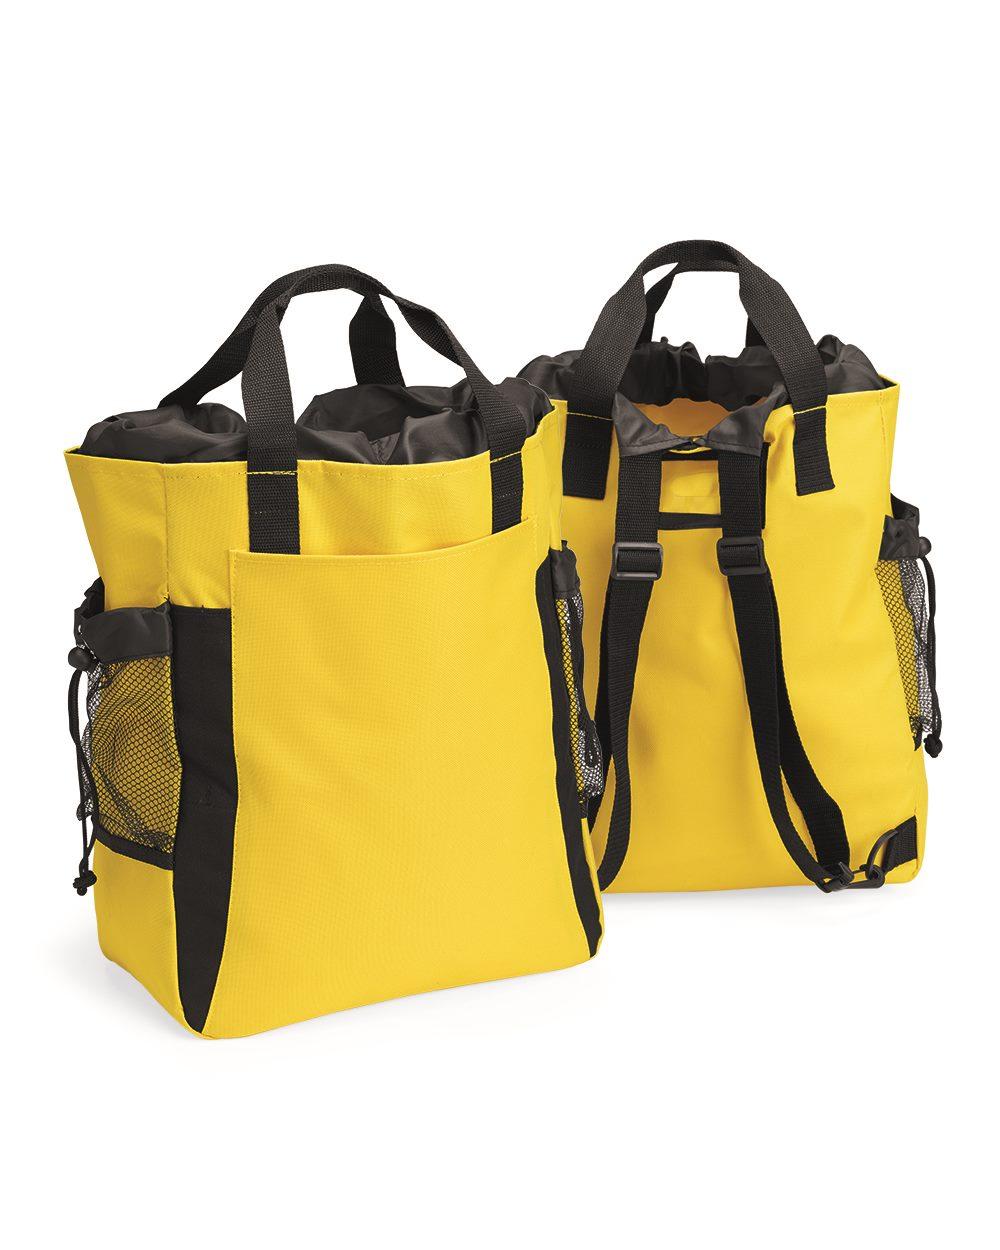 e498b71695b Liberty Bags 7291 - New York Backpack Tote $6.24 - Bags